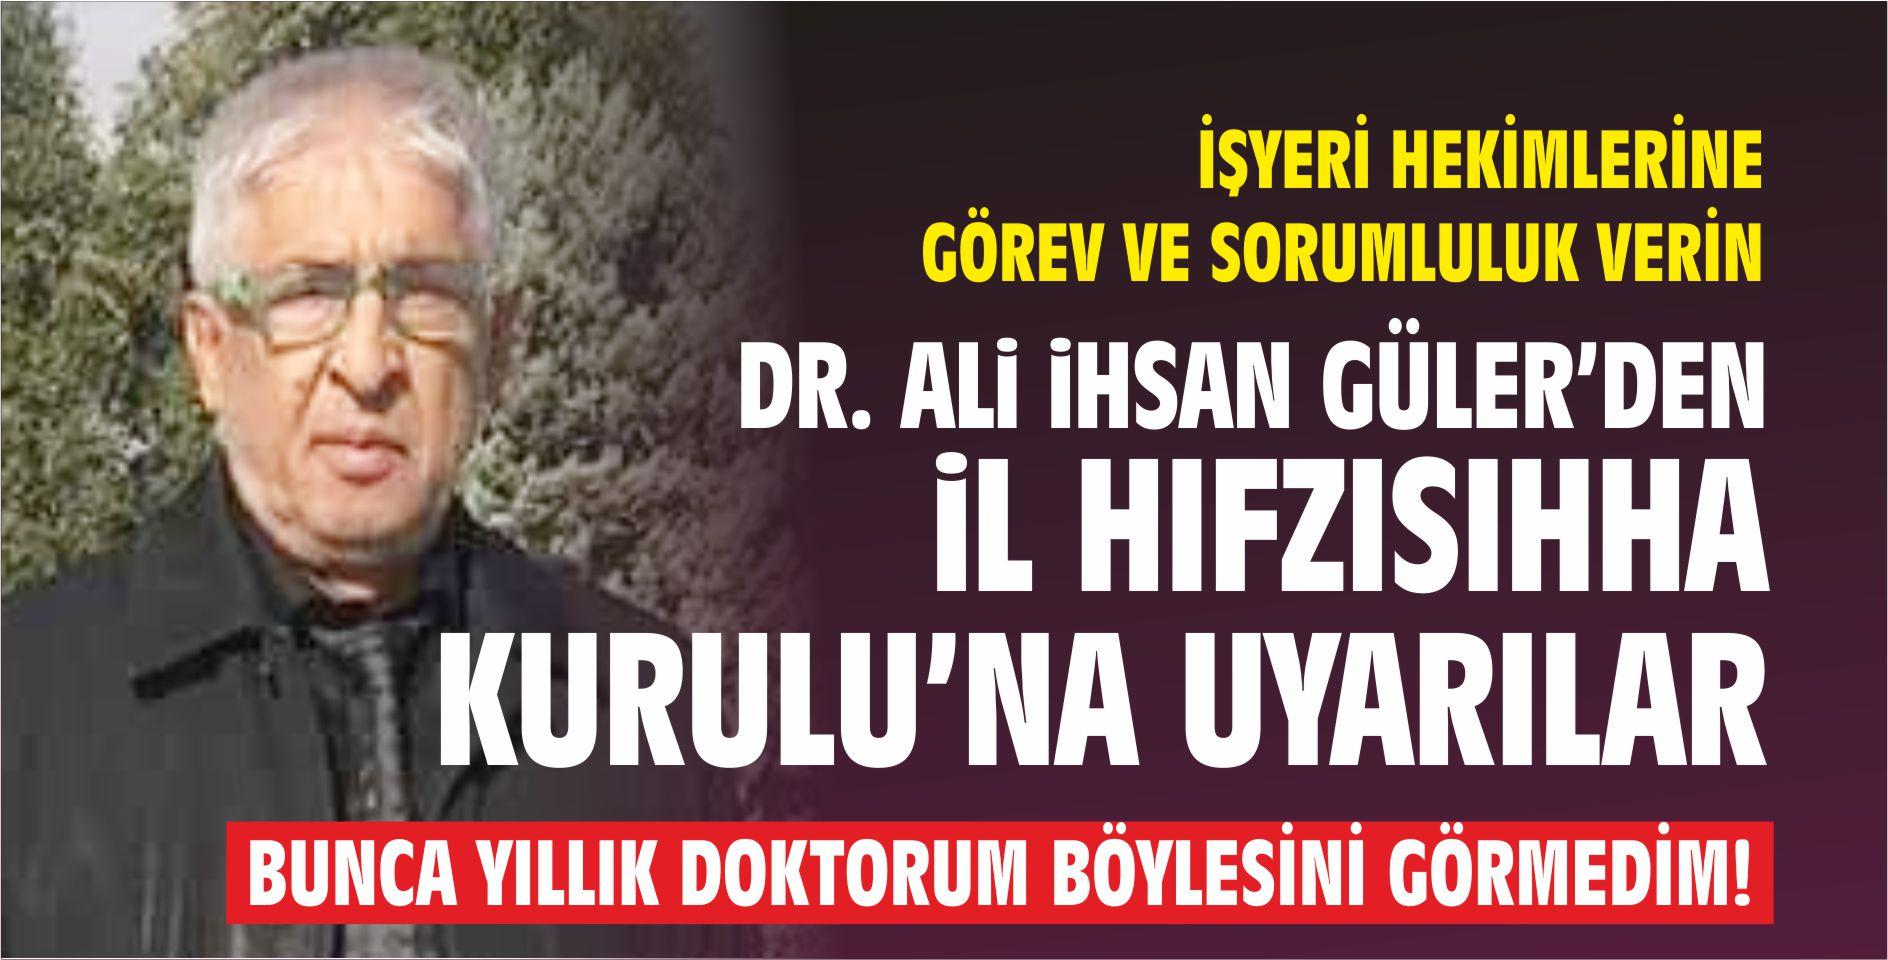 DR. ALİ İHSAN GÜLER'DEN HIFZISIHHA KURULU'NA UYARILAR